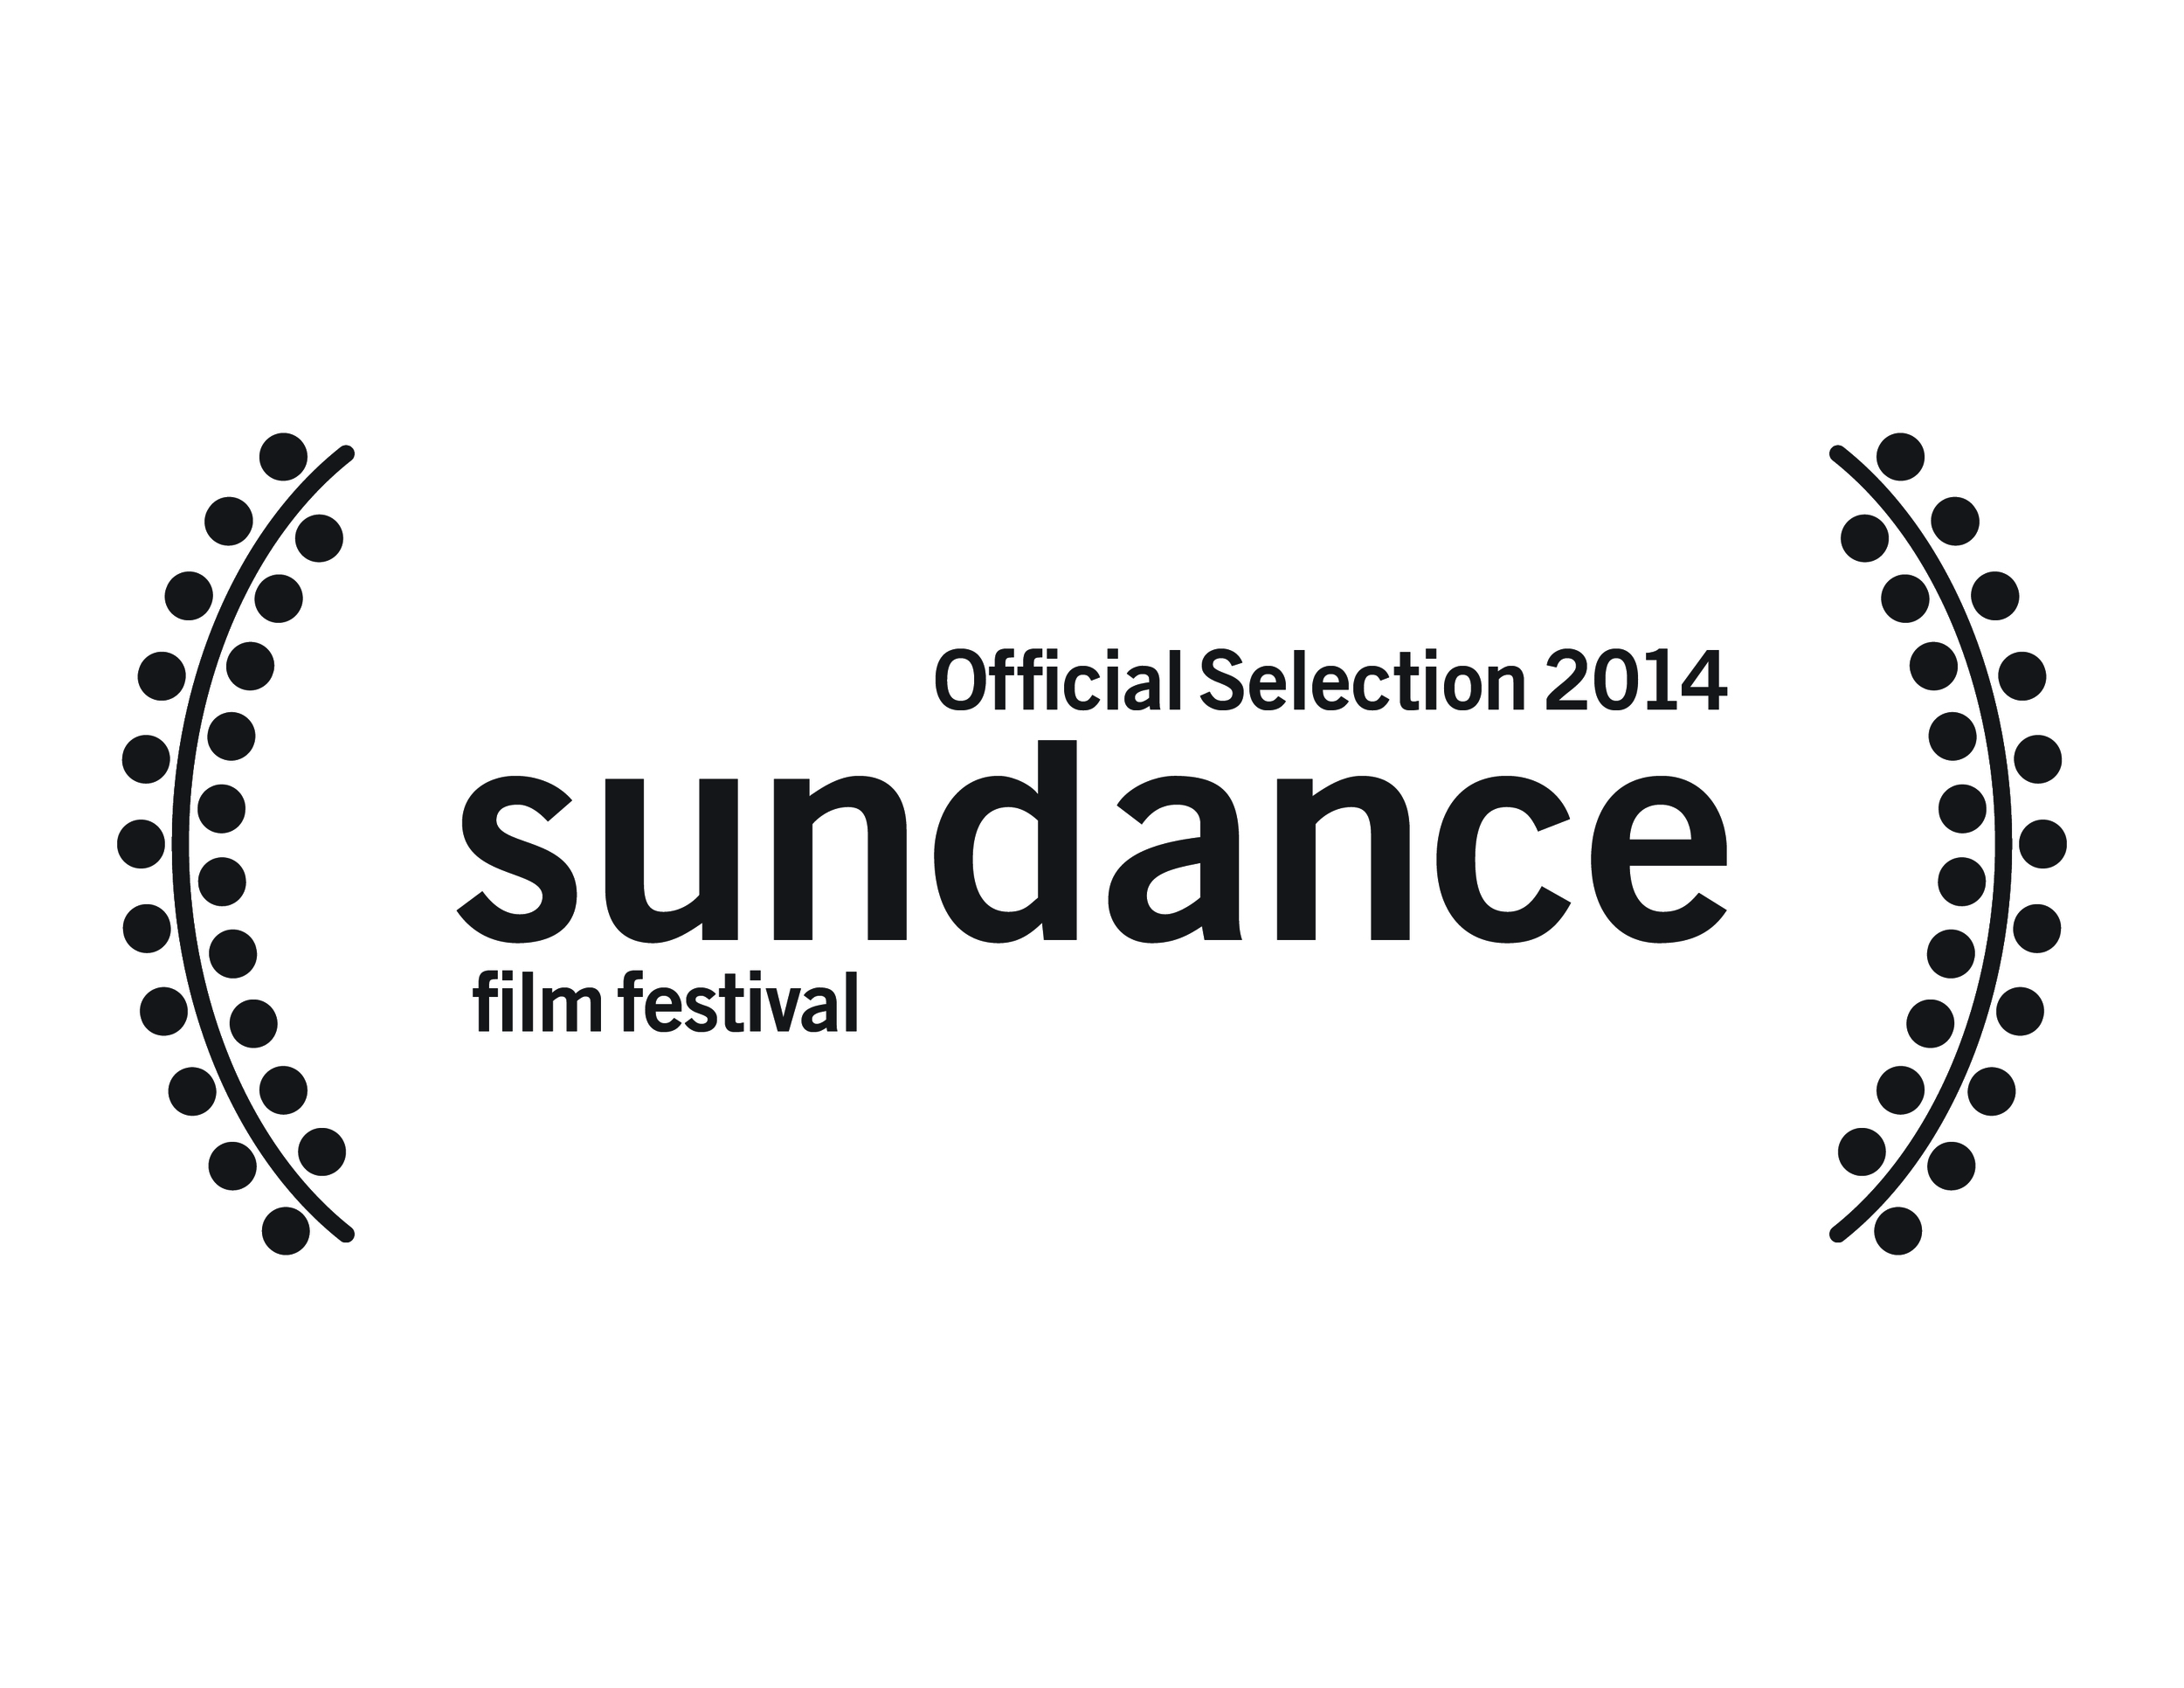 SundanceOfficialSelection2014LaurelBlack.jpg